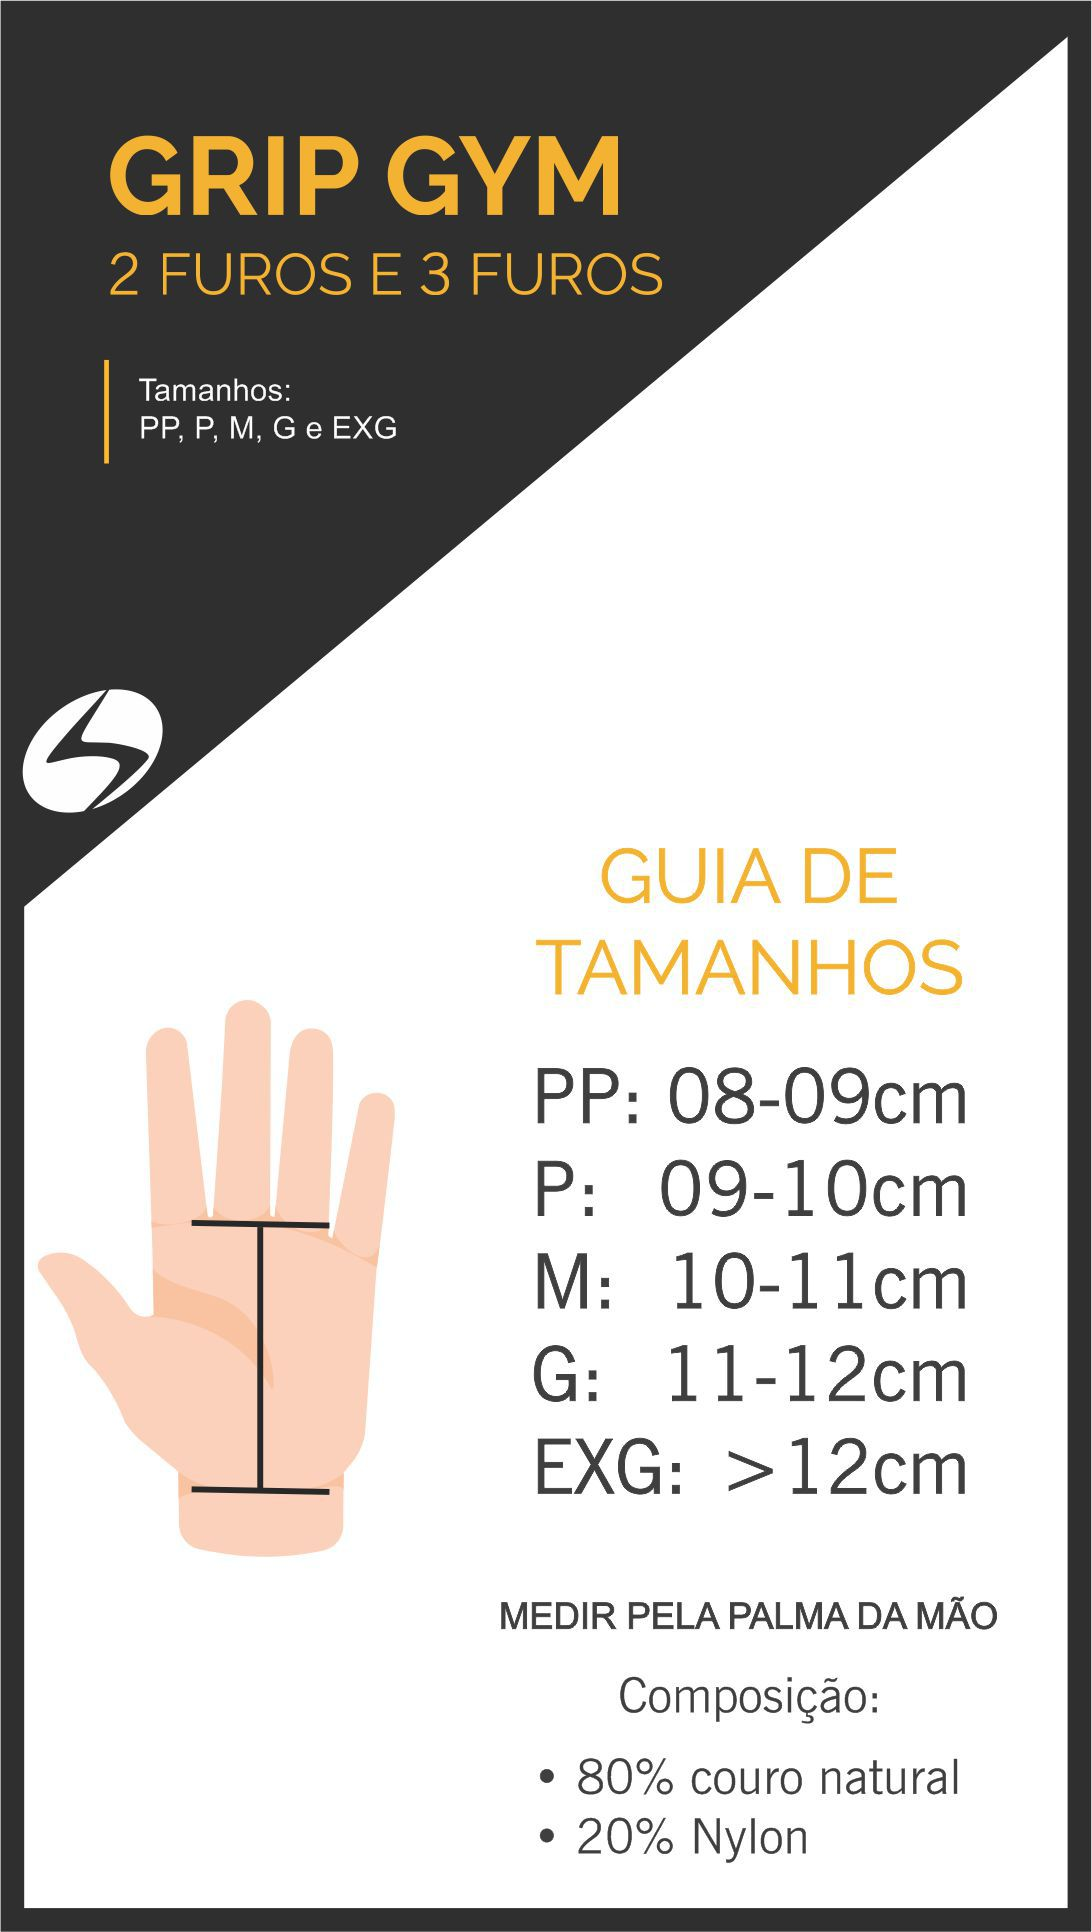 Grip Gym Basic 2.0 - Hand Grip - Crossfit - Vermelho